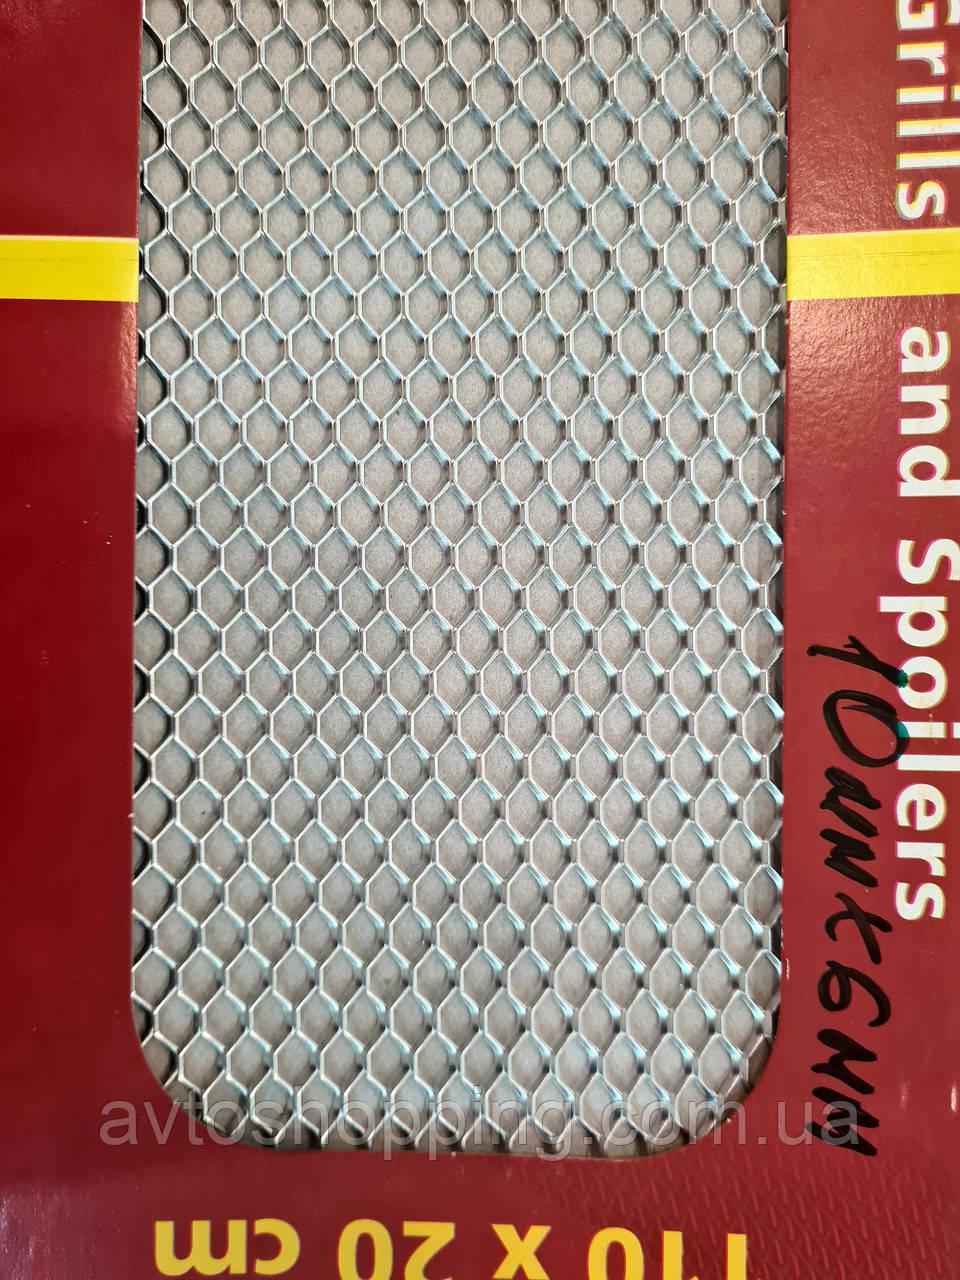 Сетка декоративная Sahler 100*20см Хром №4, 10мм/6мм, СЕТКА Радиатора, сетка декоративная в Бампер